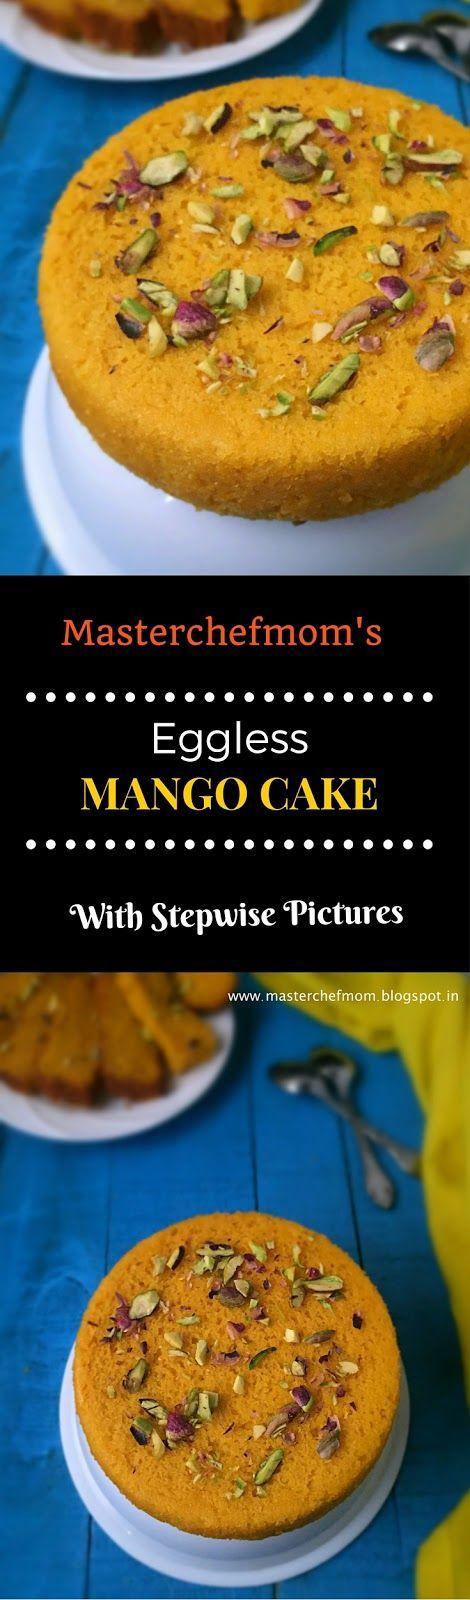 MASTERCHEFMOM: Eggless Mango Cake | How to Make a Delicious Mango Cake at Home | Easy Recipe | Stepwise Pictures by Masterchefmom